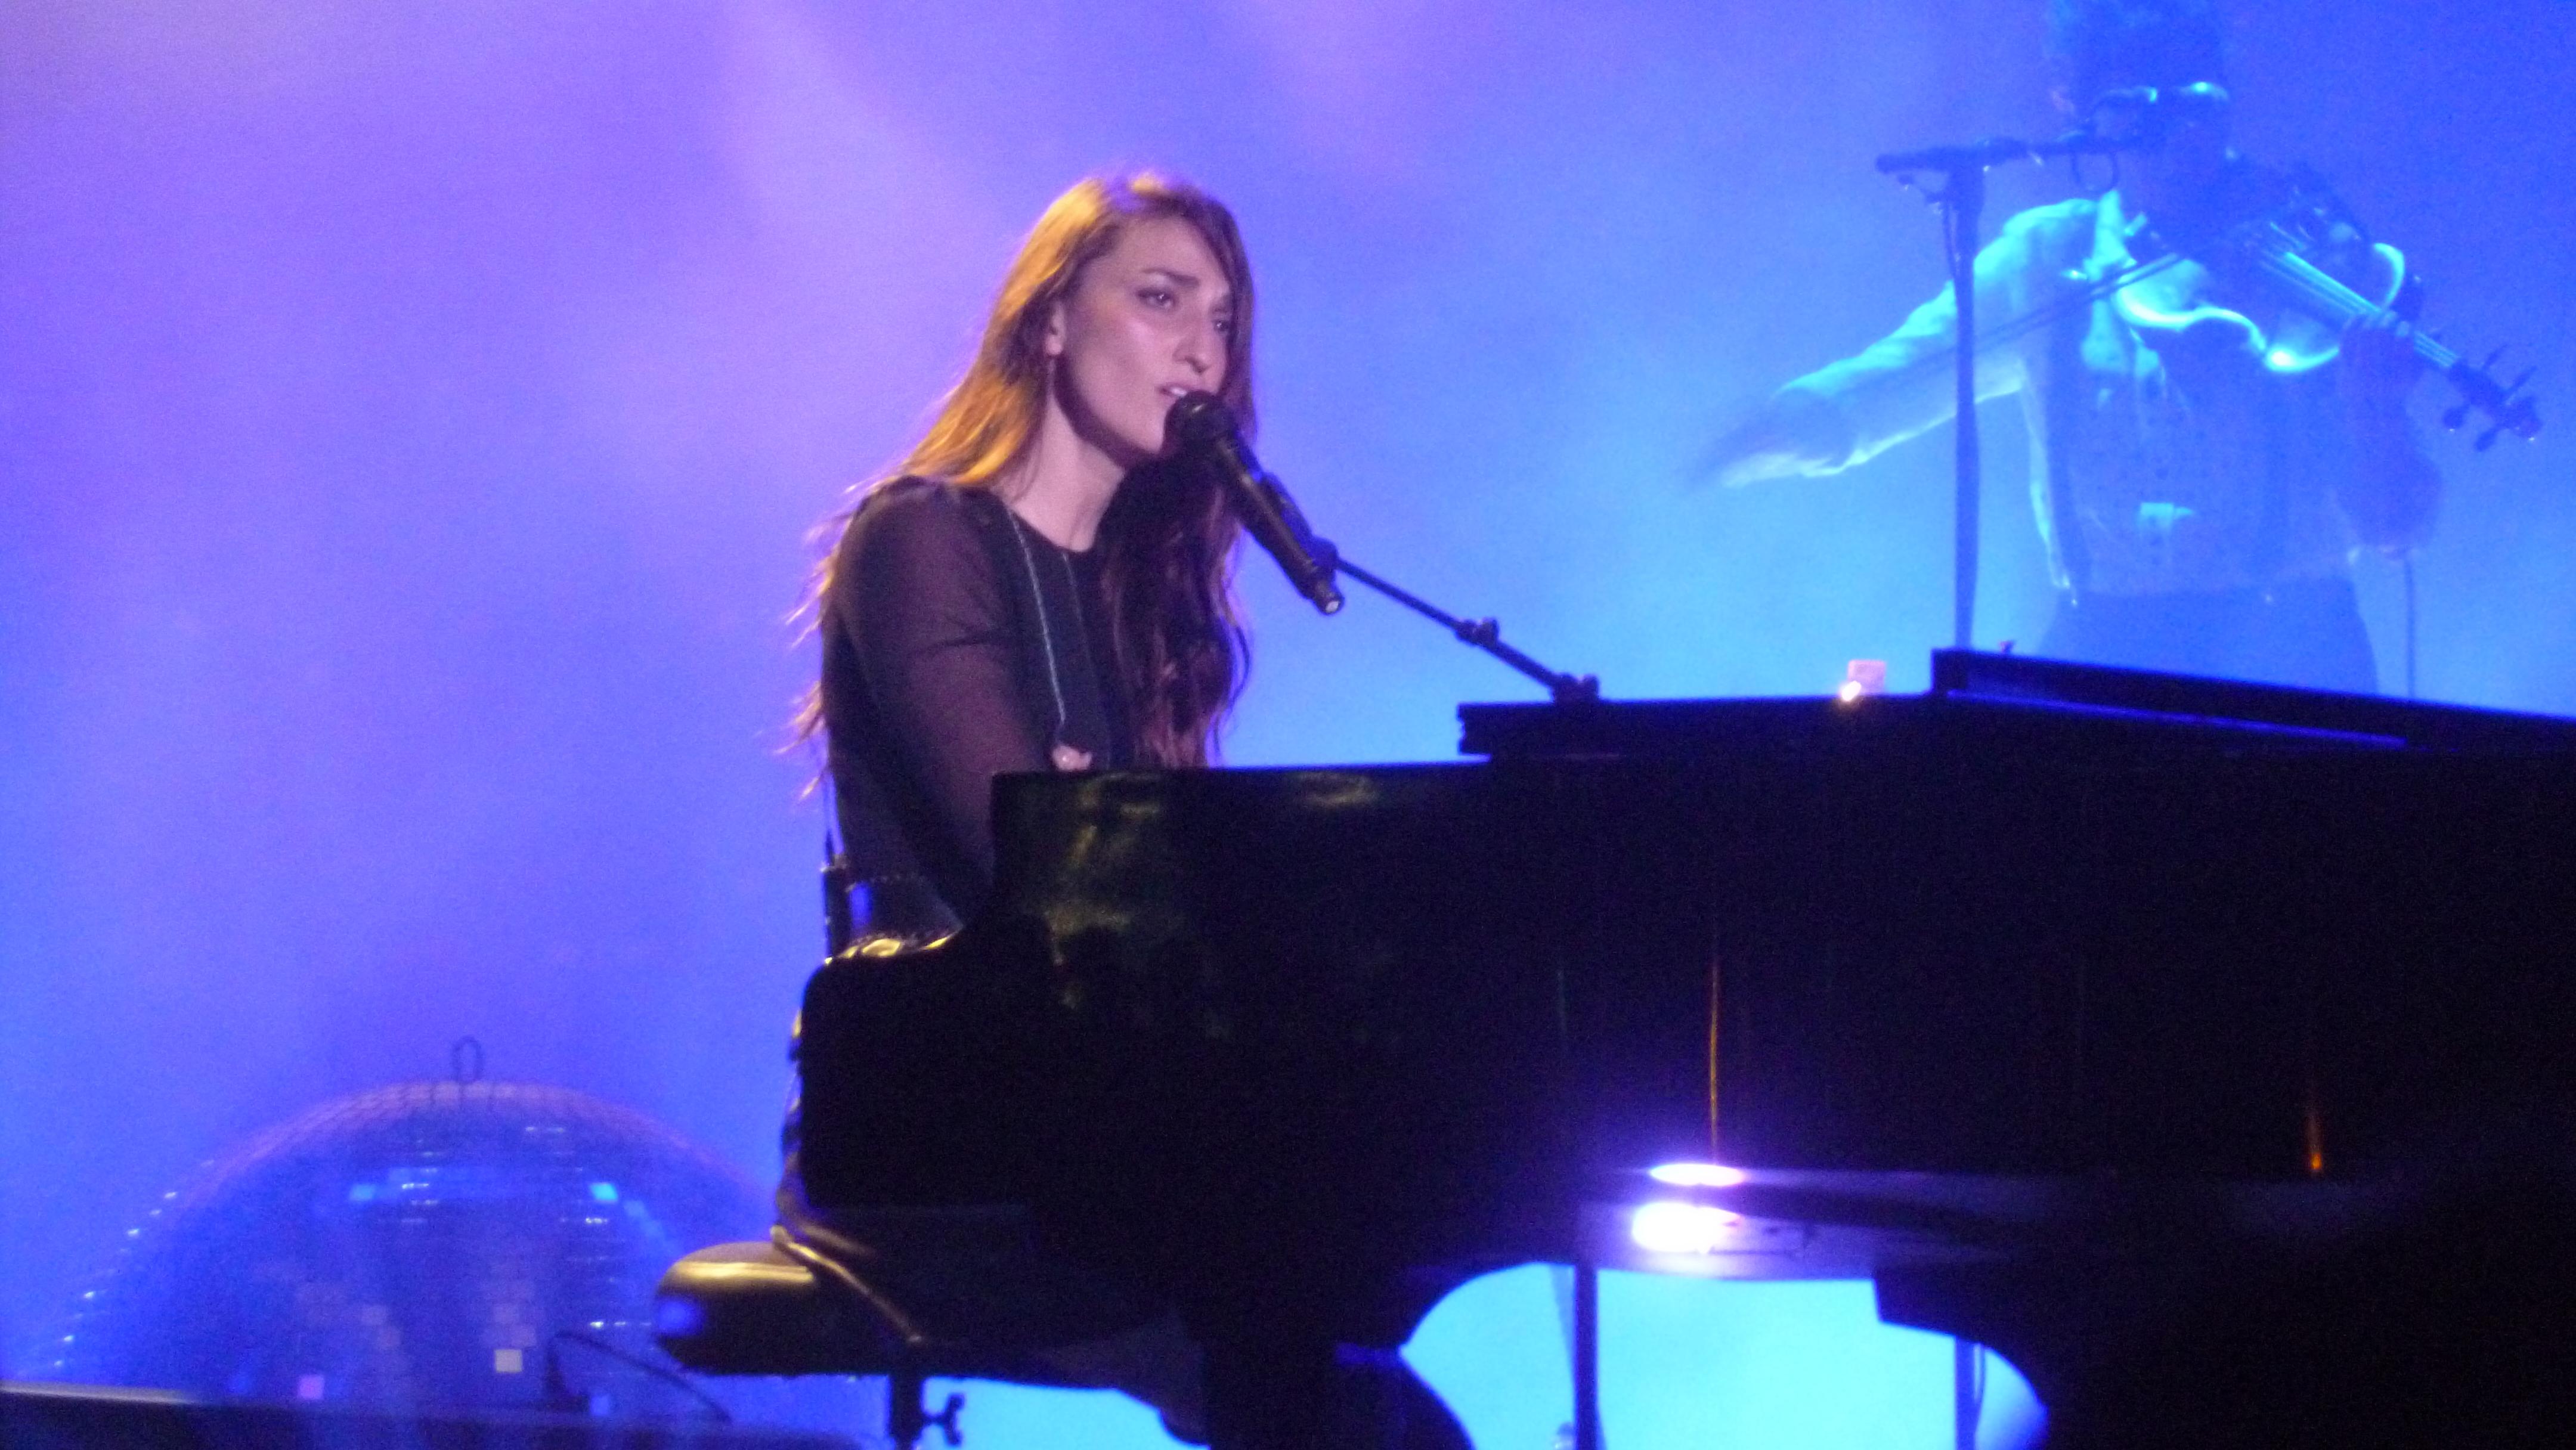 Little Black Dress Tour Sara Bareilles In Concert In